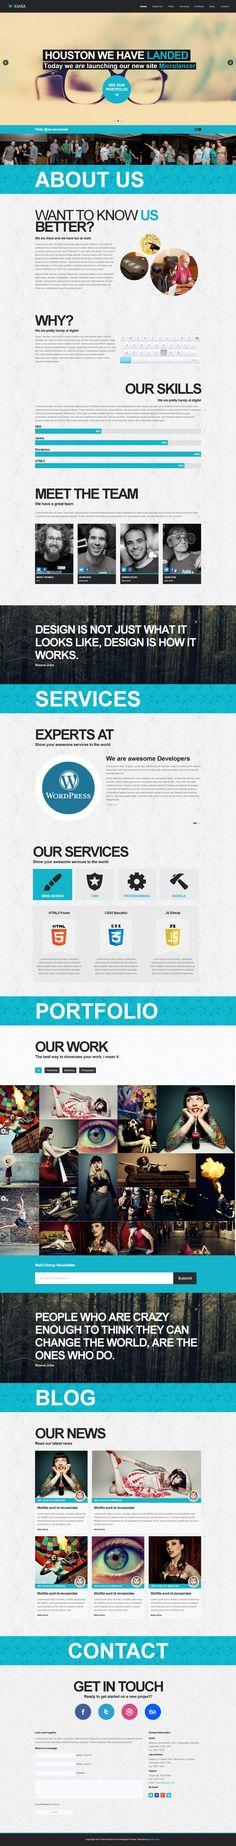 Xiara - #Responsive Onepage #Parallax #HTML Template on #Behance #Webdesign